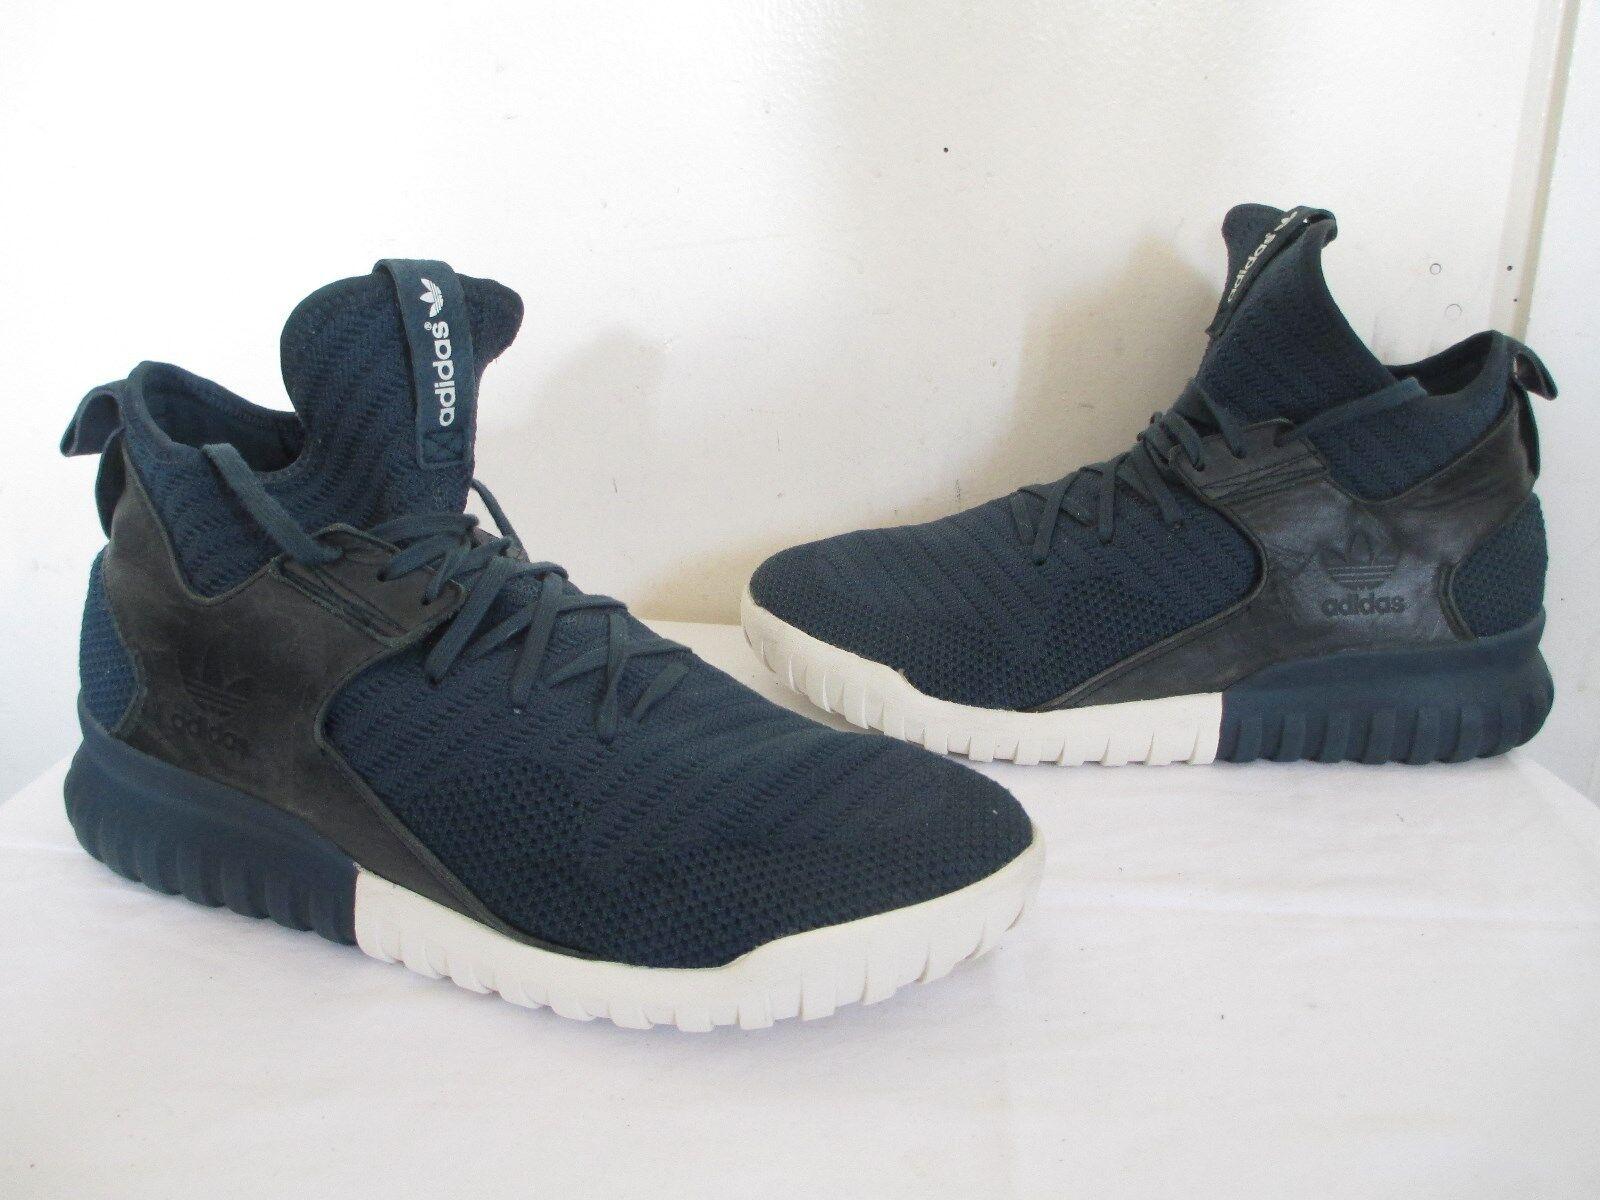 competitive price 49a4a 3da76 Adidas Originals tubular Premium x x x primeknit s81675 Limited Edition US  13 ½ nuevo zapatos para hombres